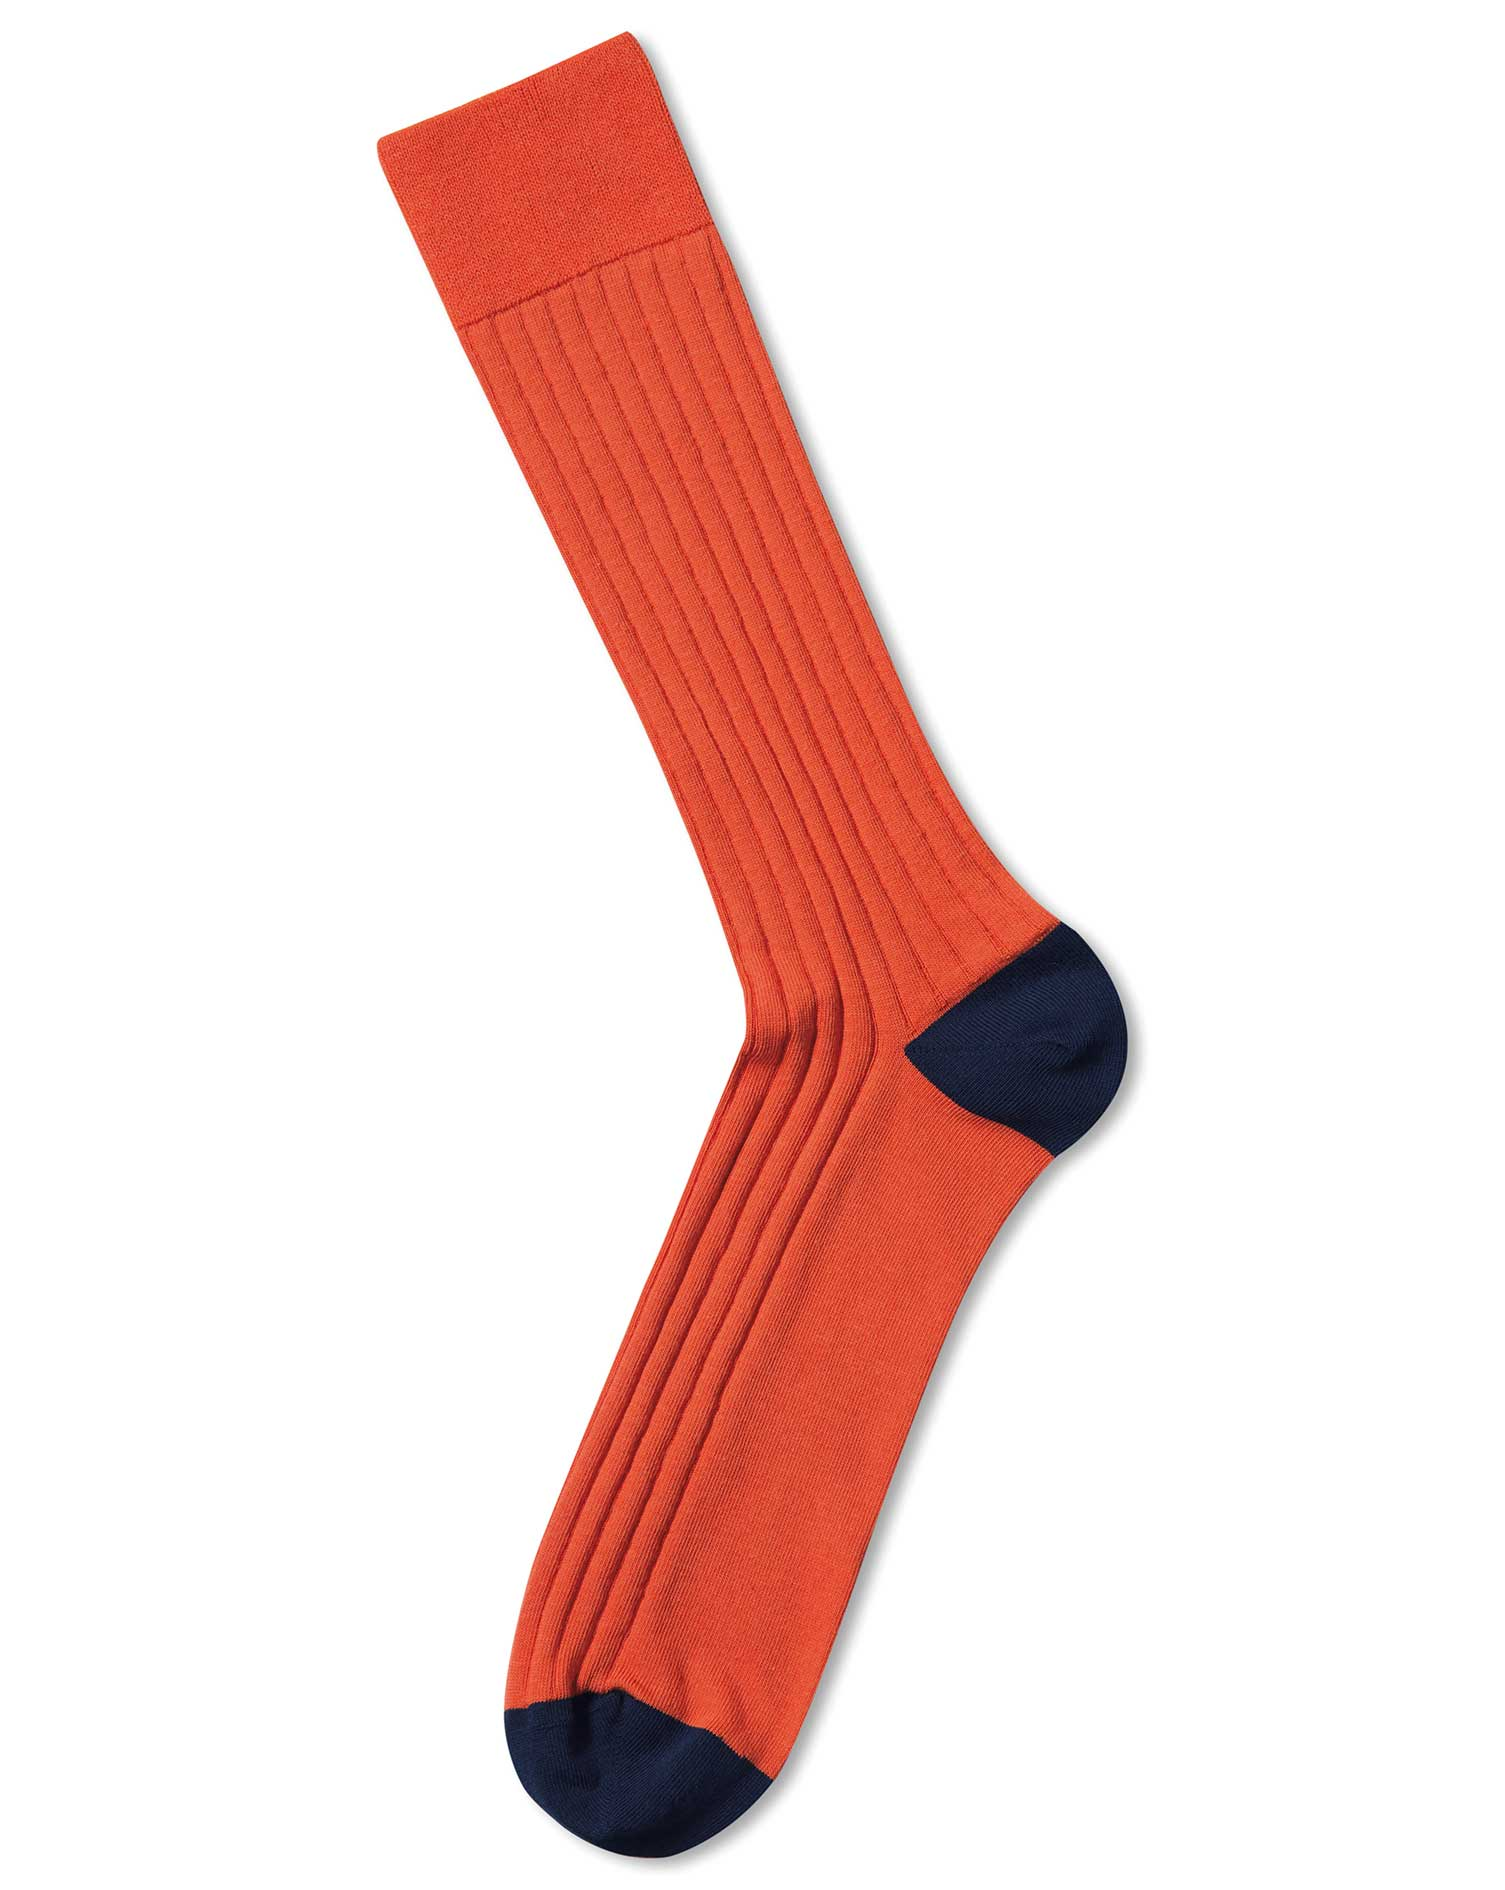 Orange Cotton Rib Socks Size Medium by Charles Tyrwhitt